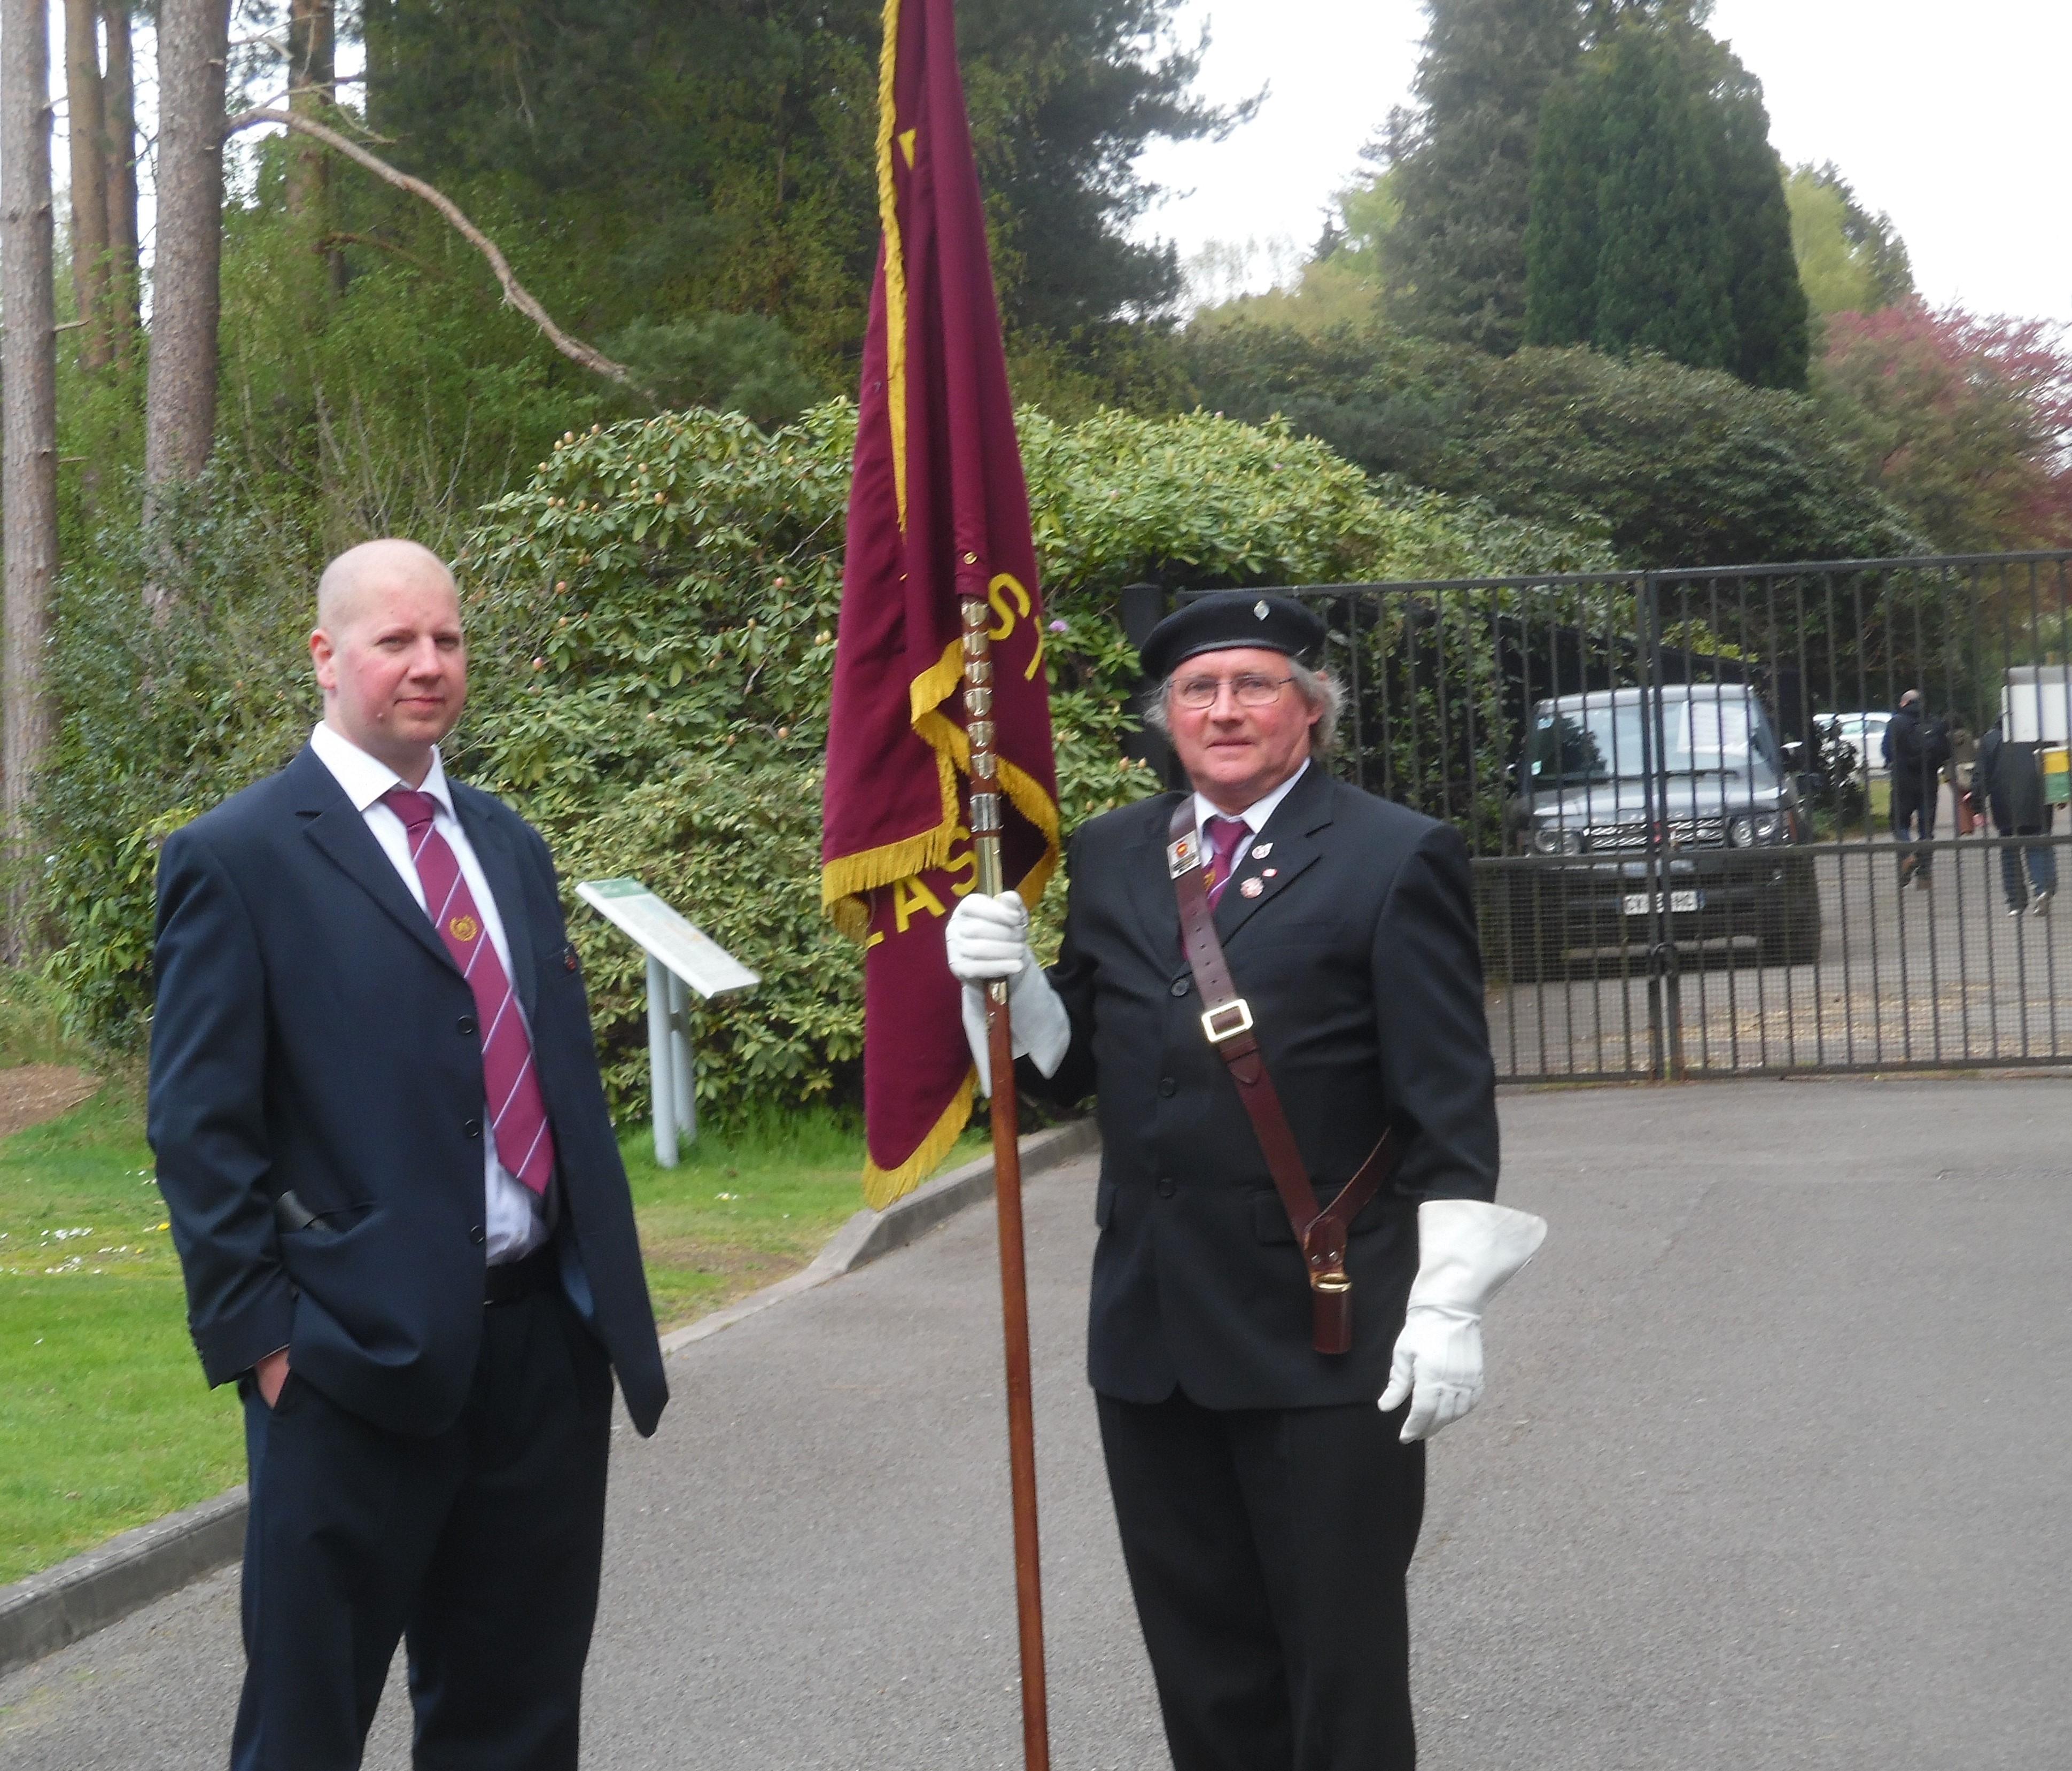 Stephen Wood and Standard Bearer Alan Lopez